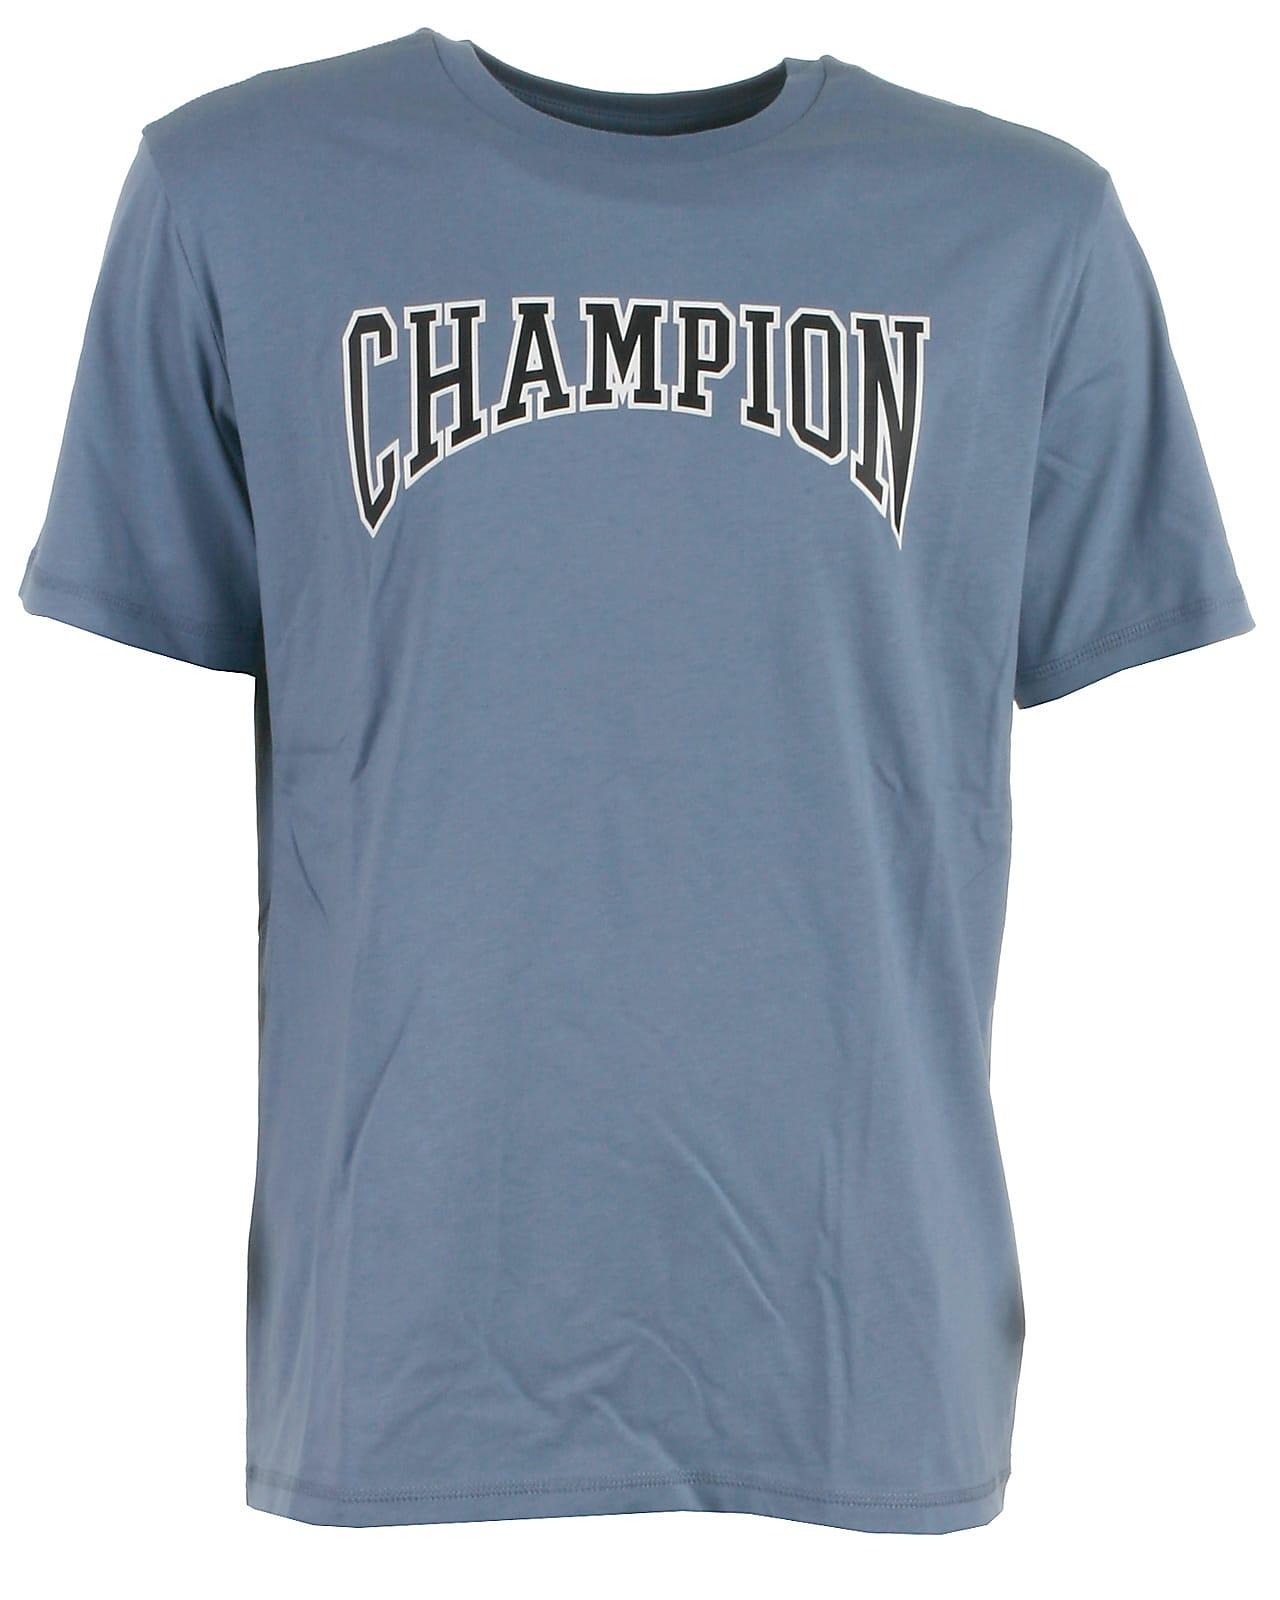 Image of Champion t-shirt s/s, ify